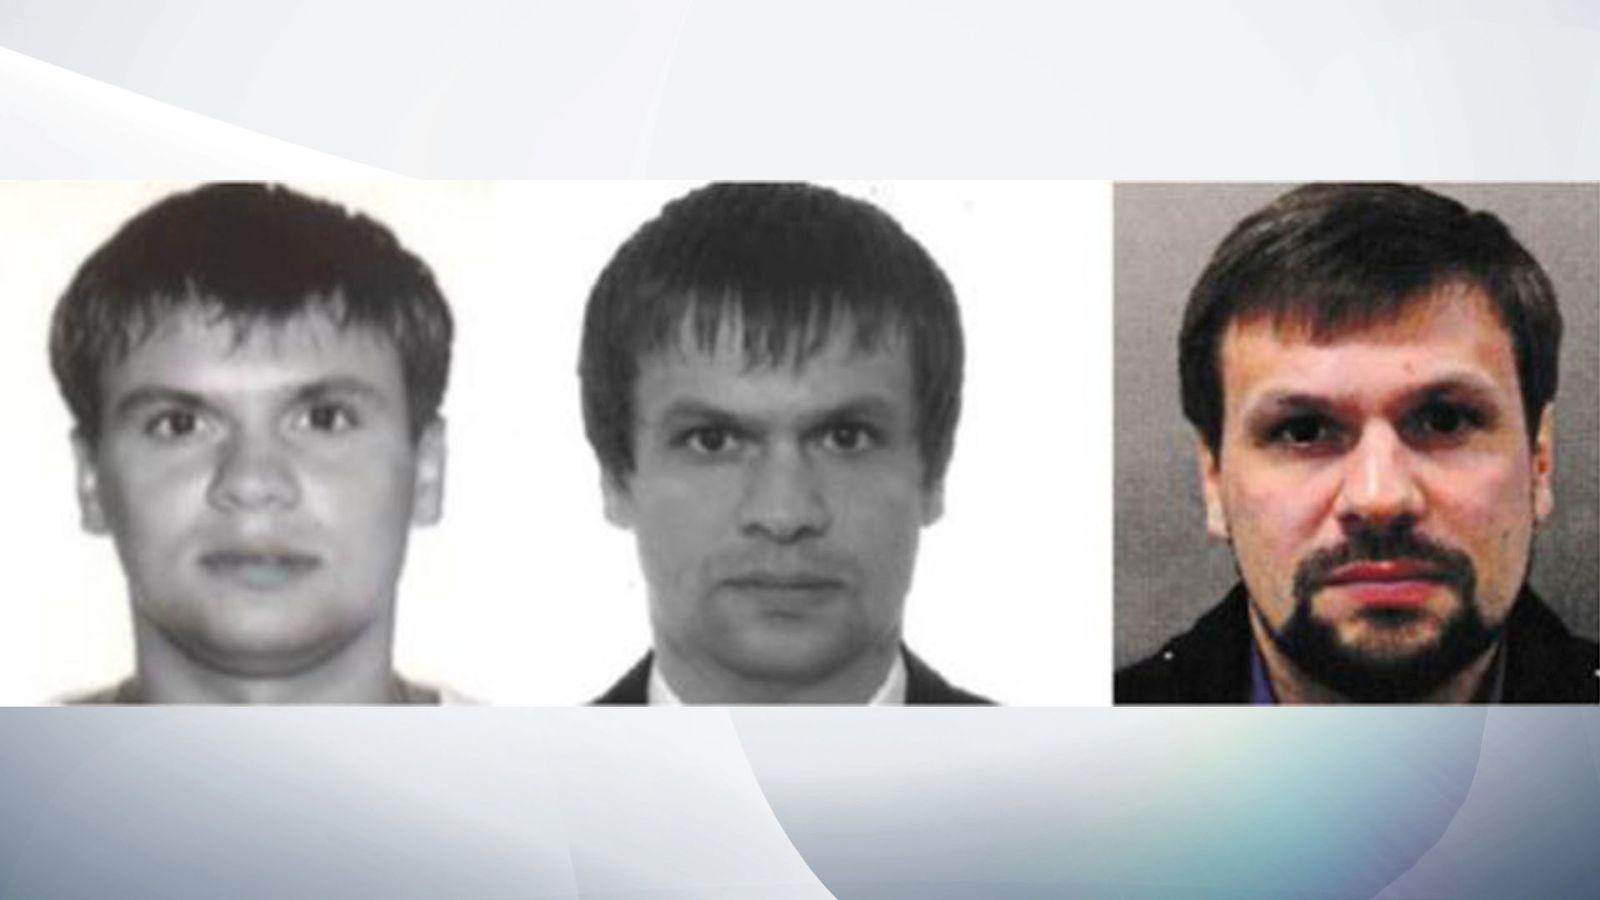 Petrov, Boshirov, Colonel Chepiga. And who do you actually believe 44